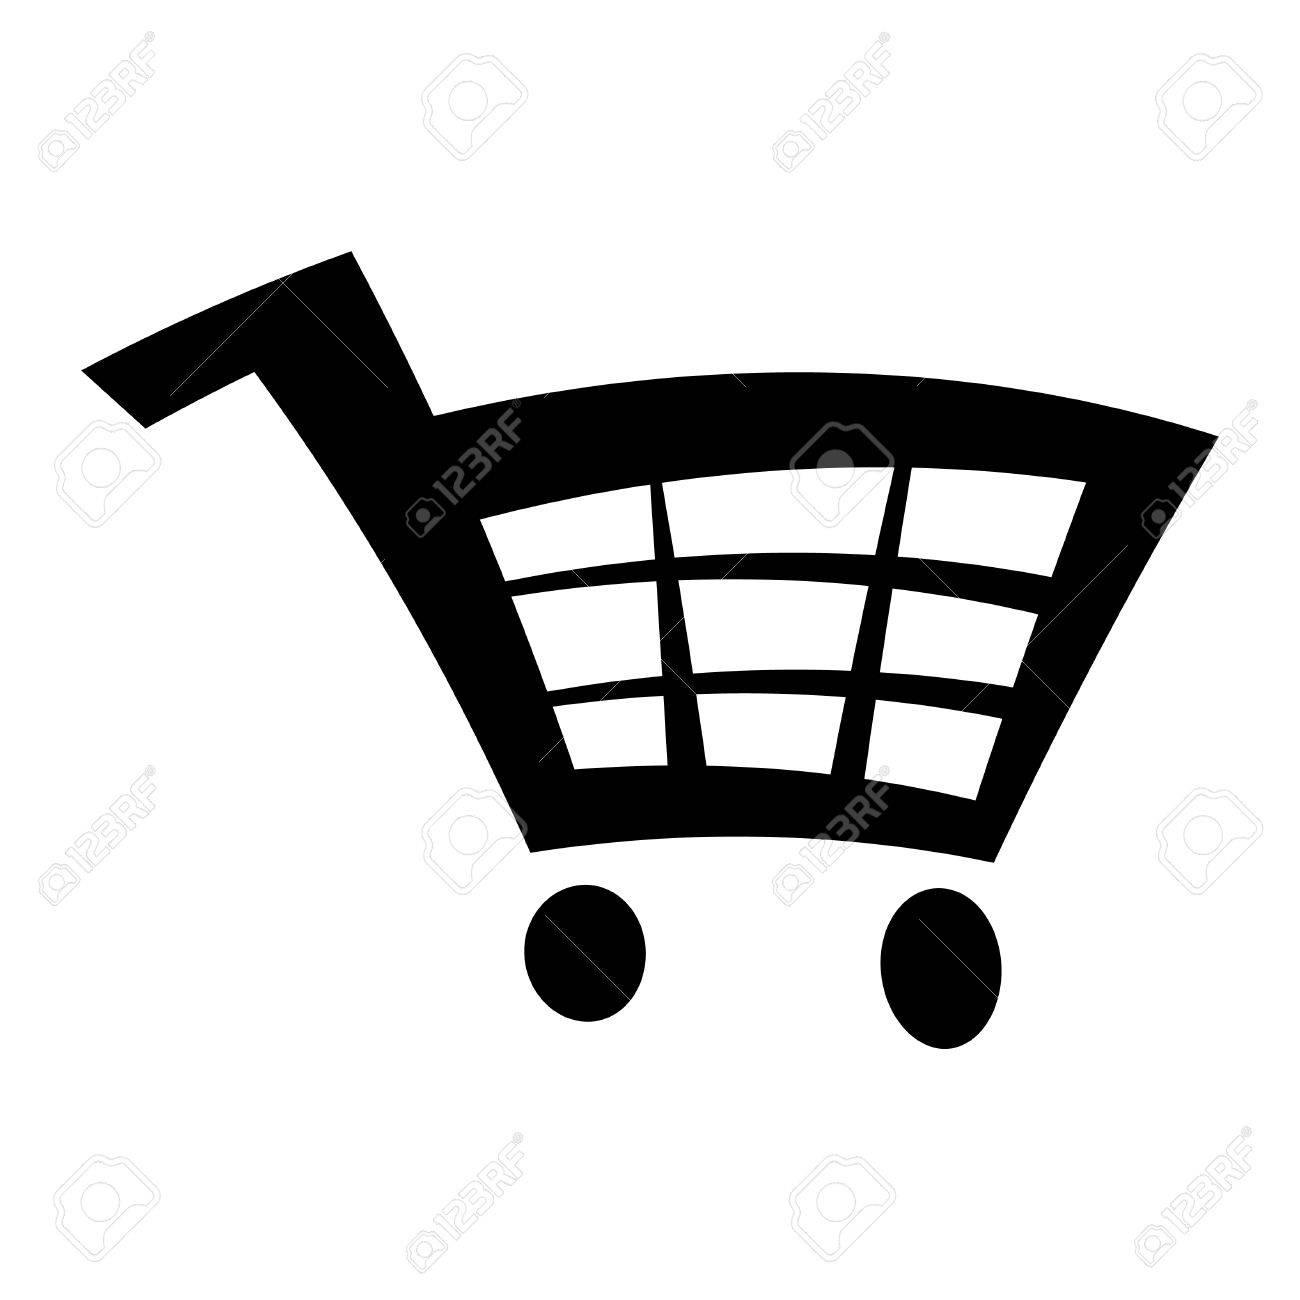 shopping cart vector icon royalty free cliparts vectors and stock rh 123rf com shopping cart vector png shopping cart vector image